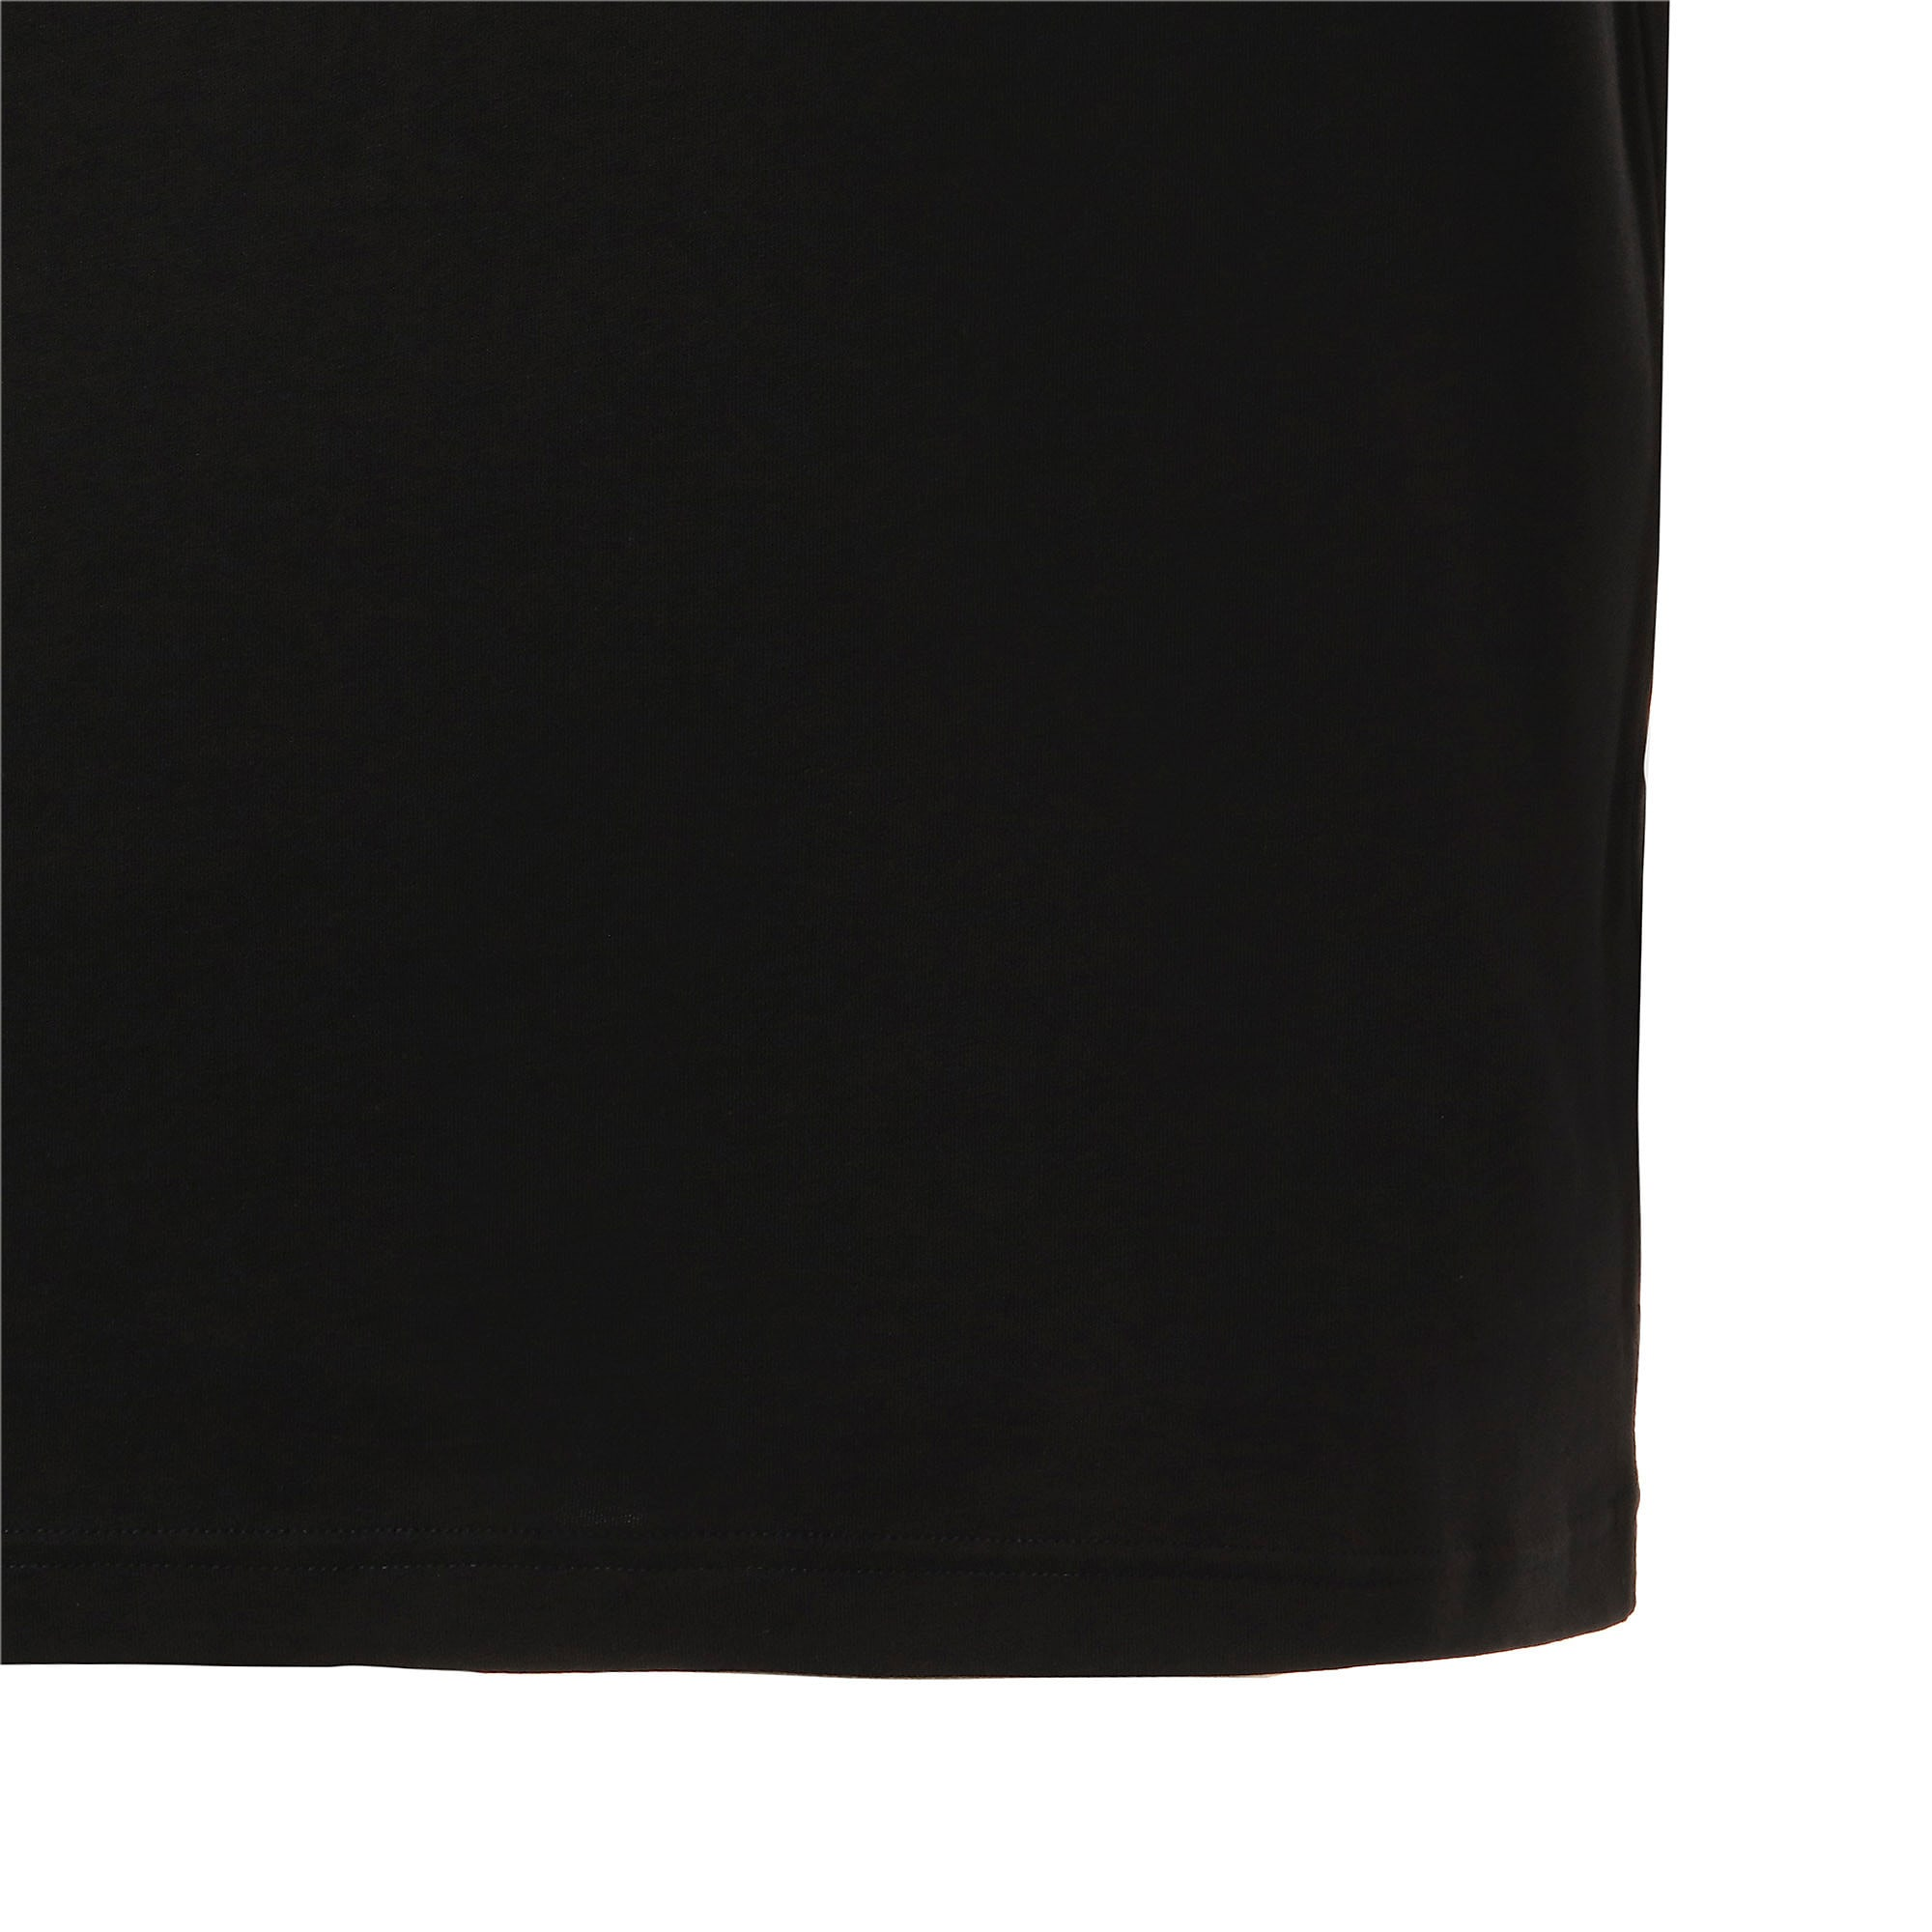 Thumbnail 9 of BMW MMS ロゴ Tシャツ +, Puma Black, medium-JPN